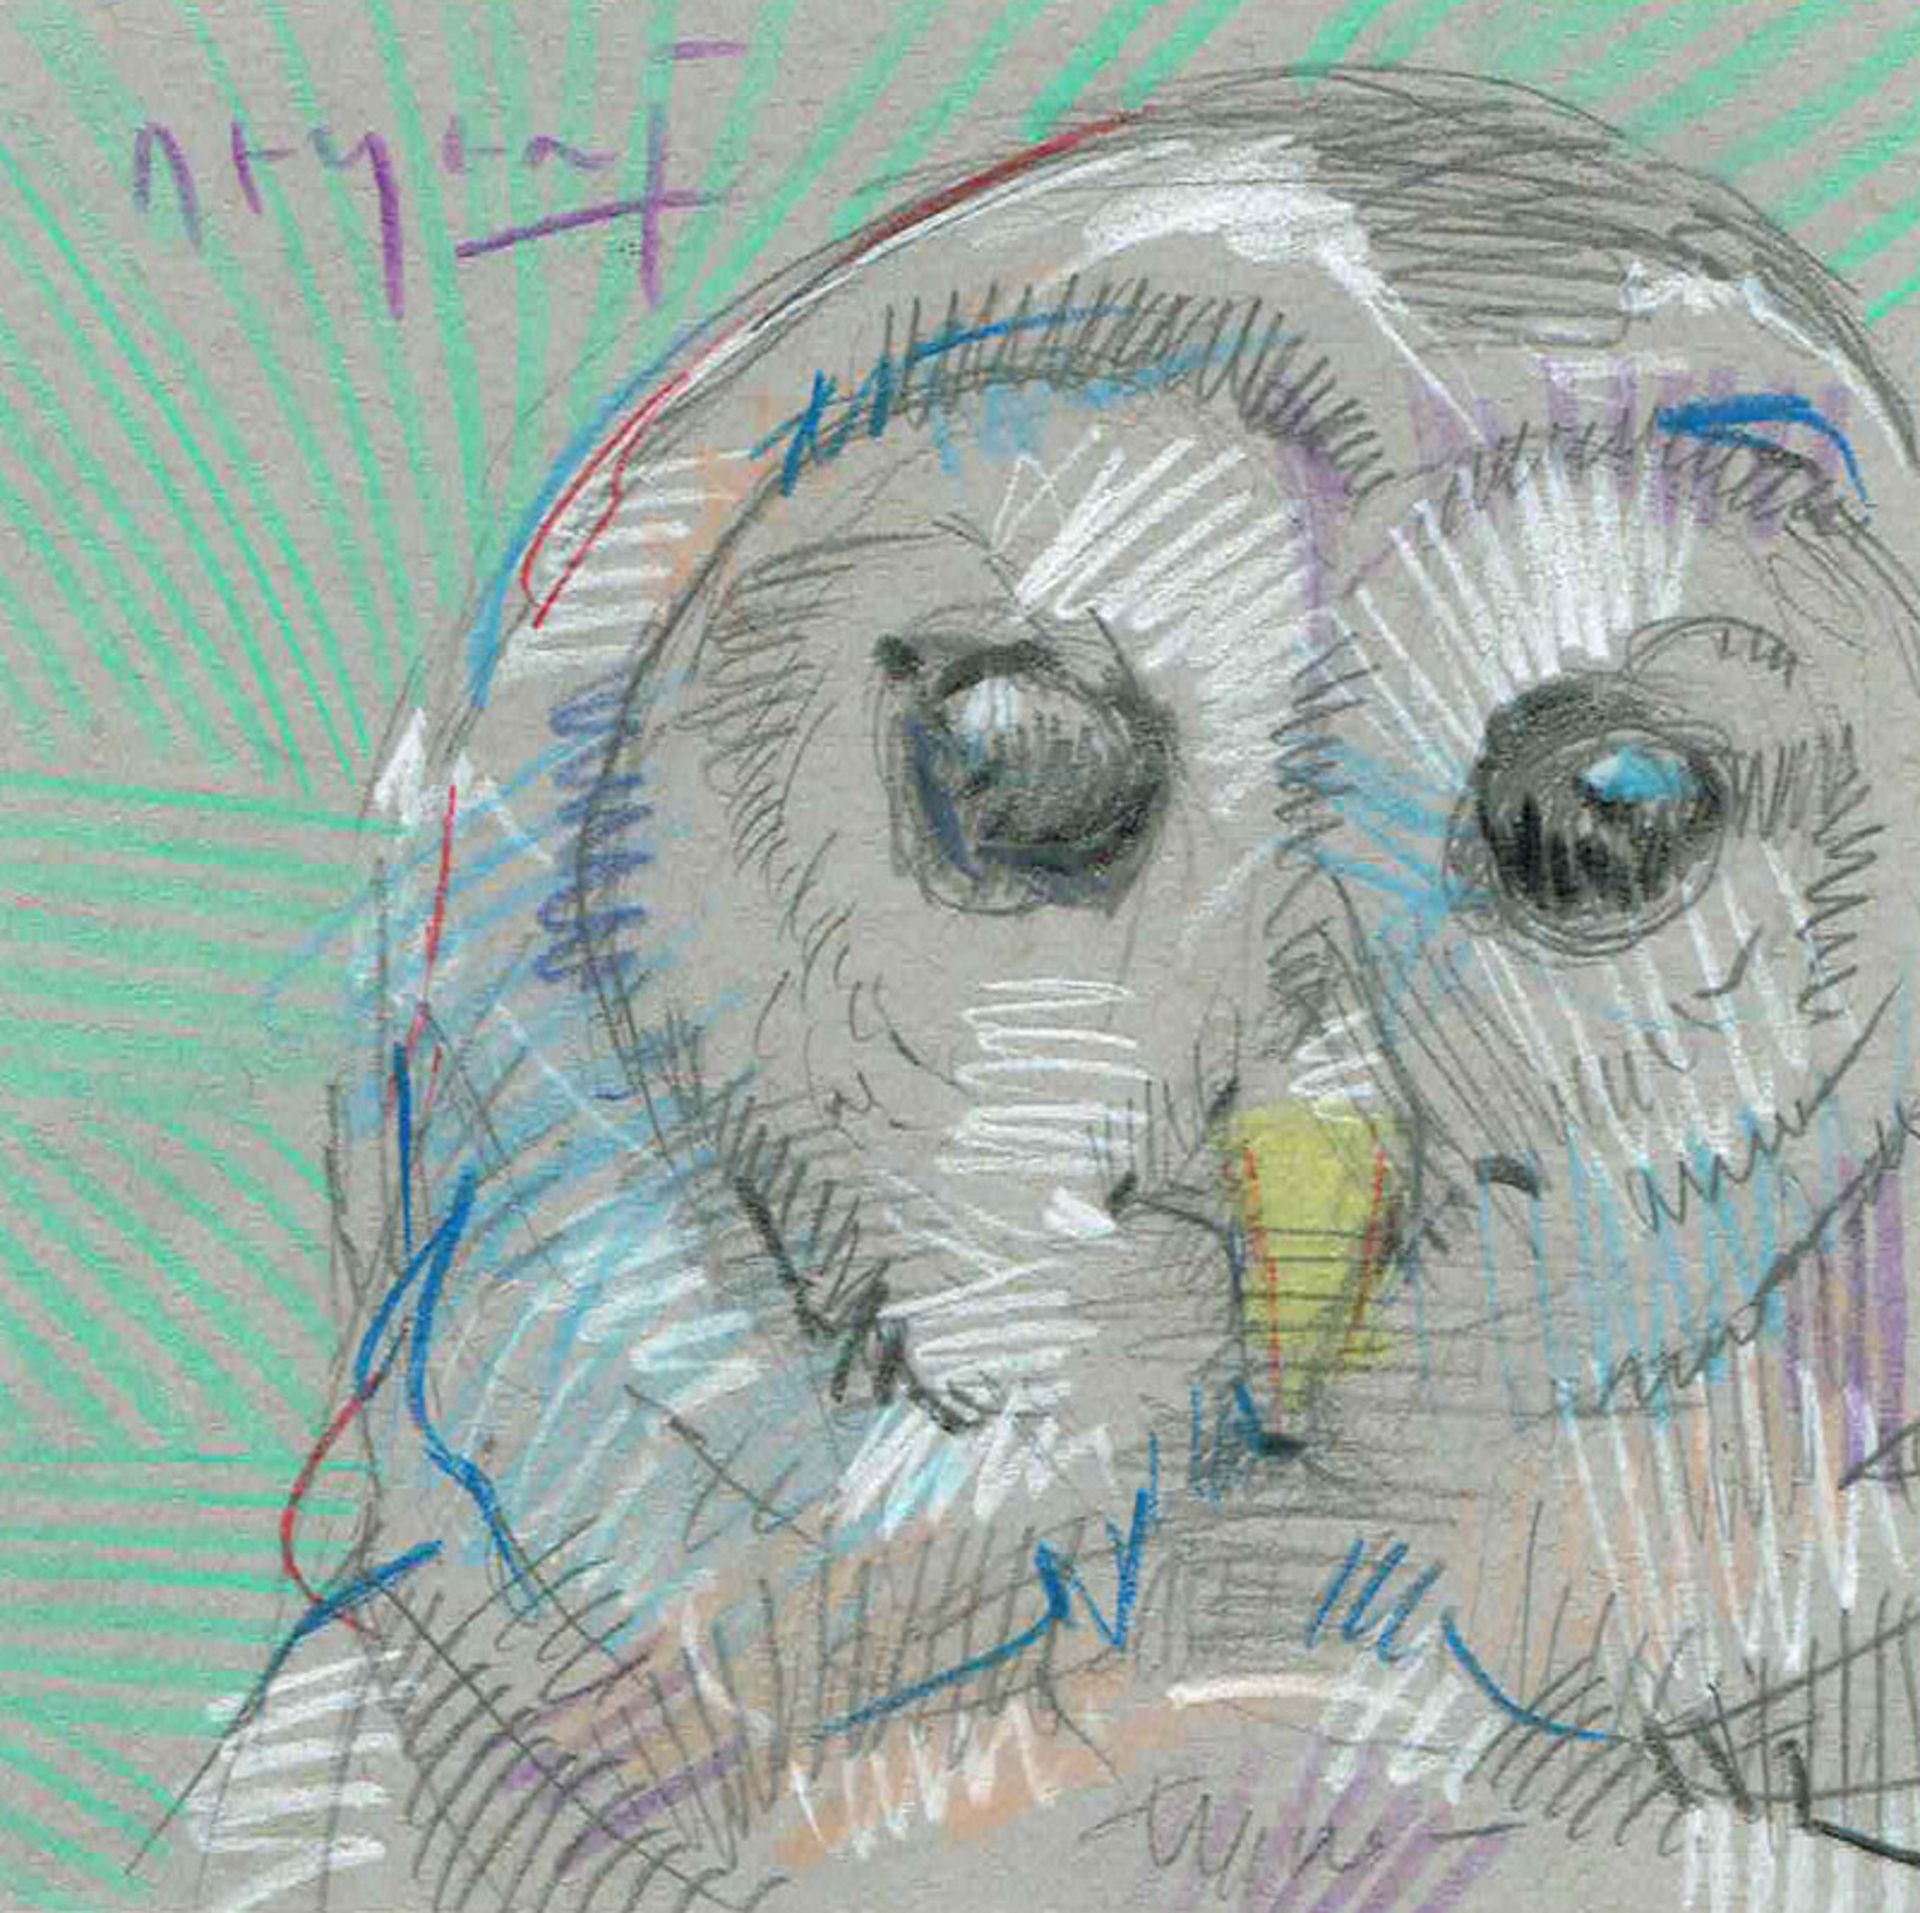 Mini Farm: Owl No. 1 by Tim Jaeger